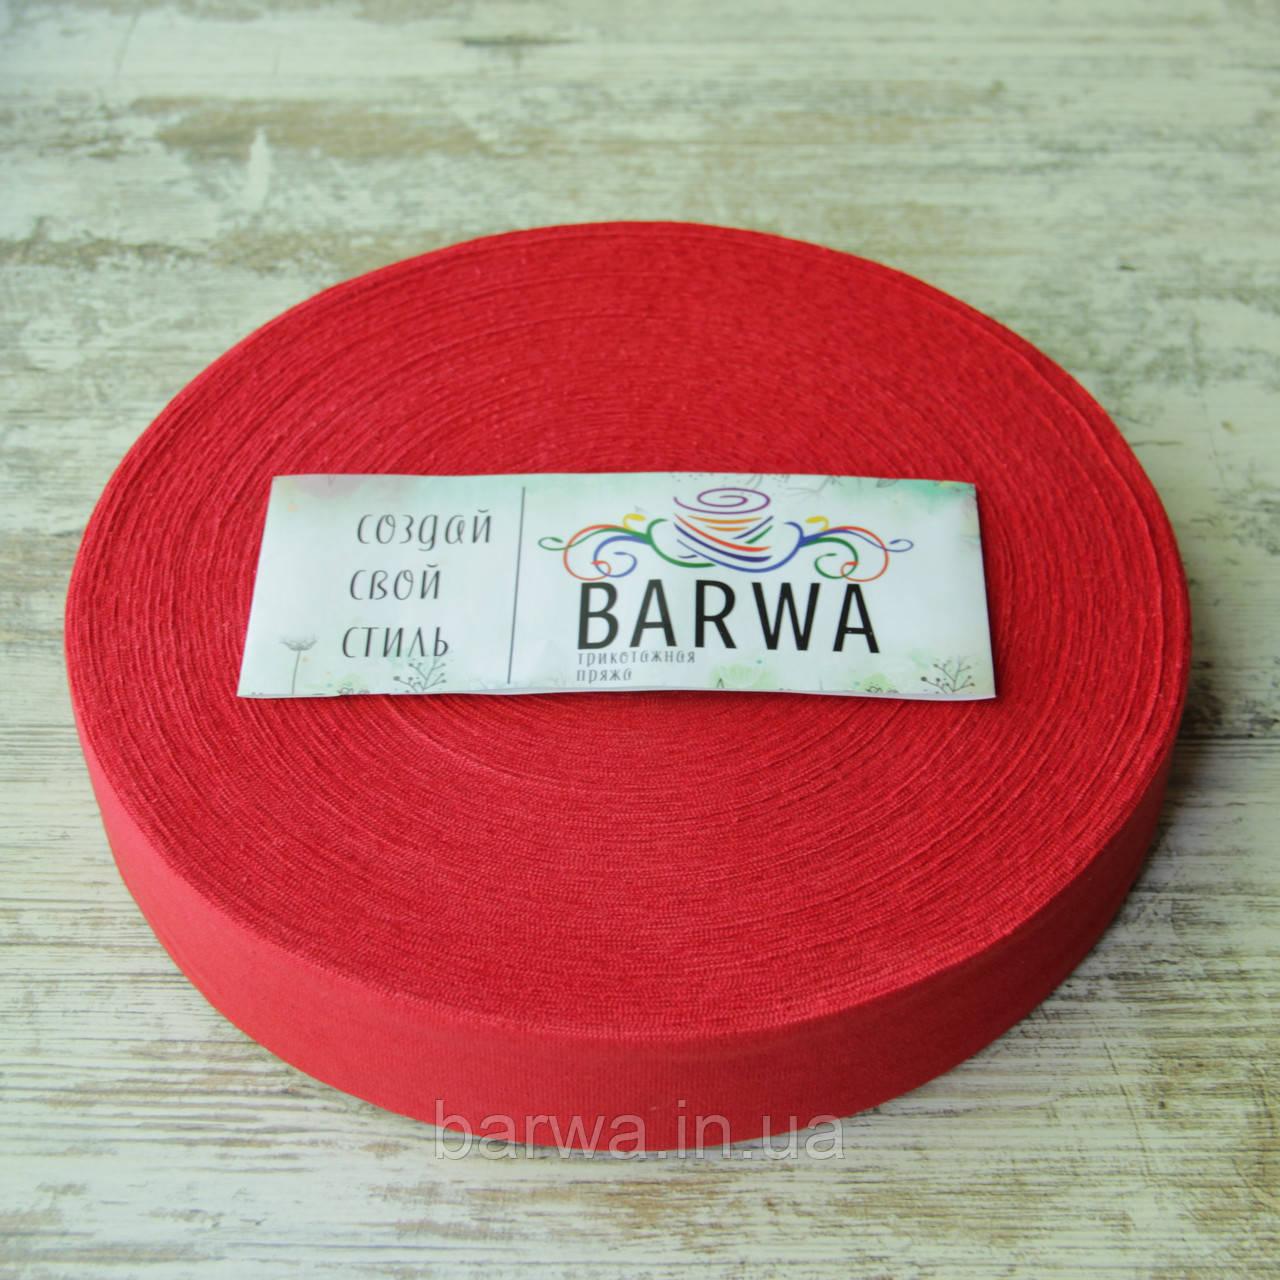 Трикотажная пряжа ВARWA standart 7-9 мм, цвет Мак